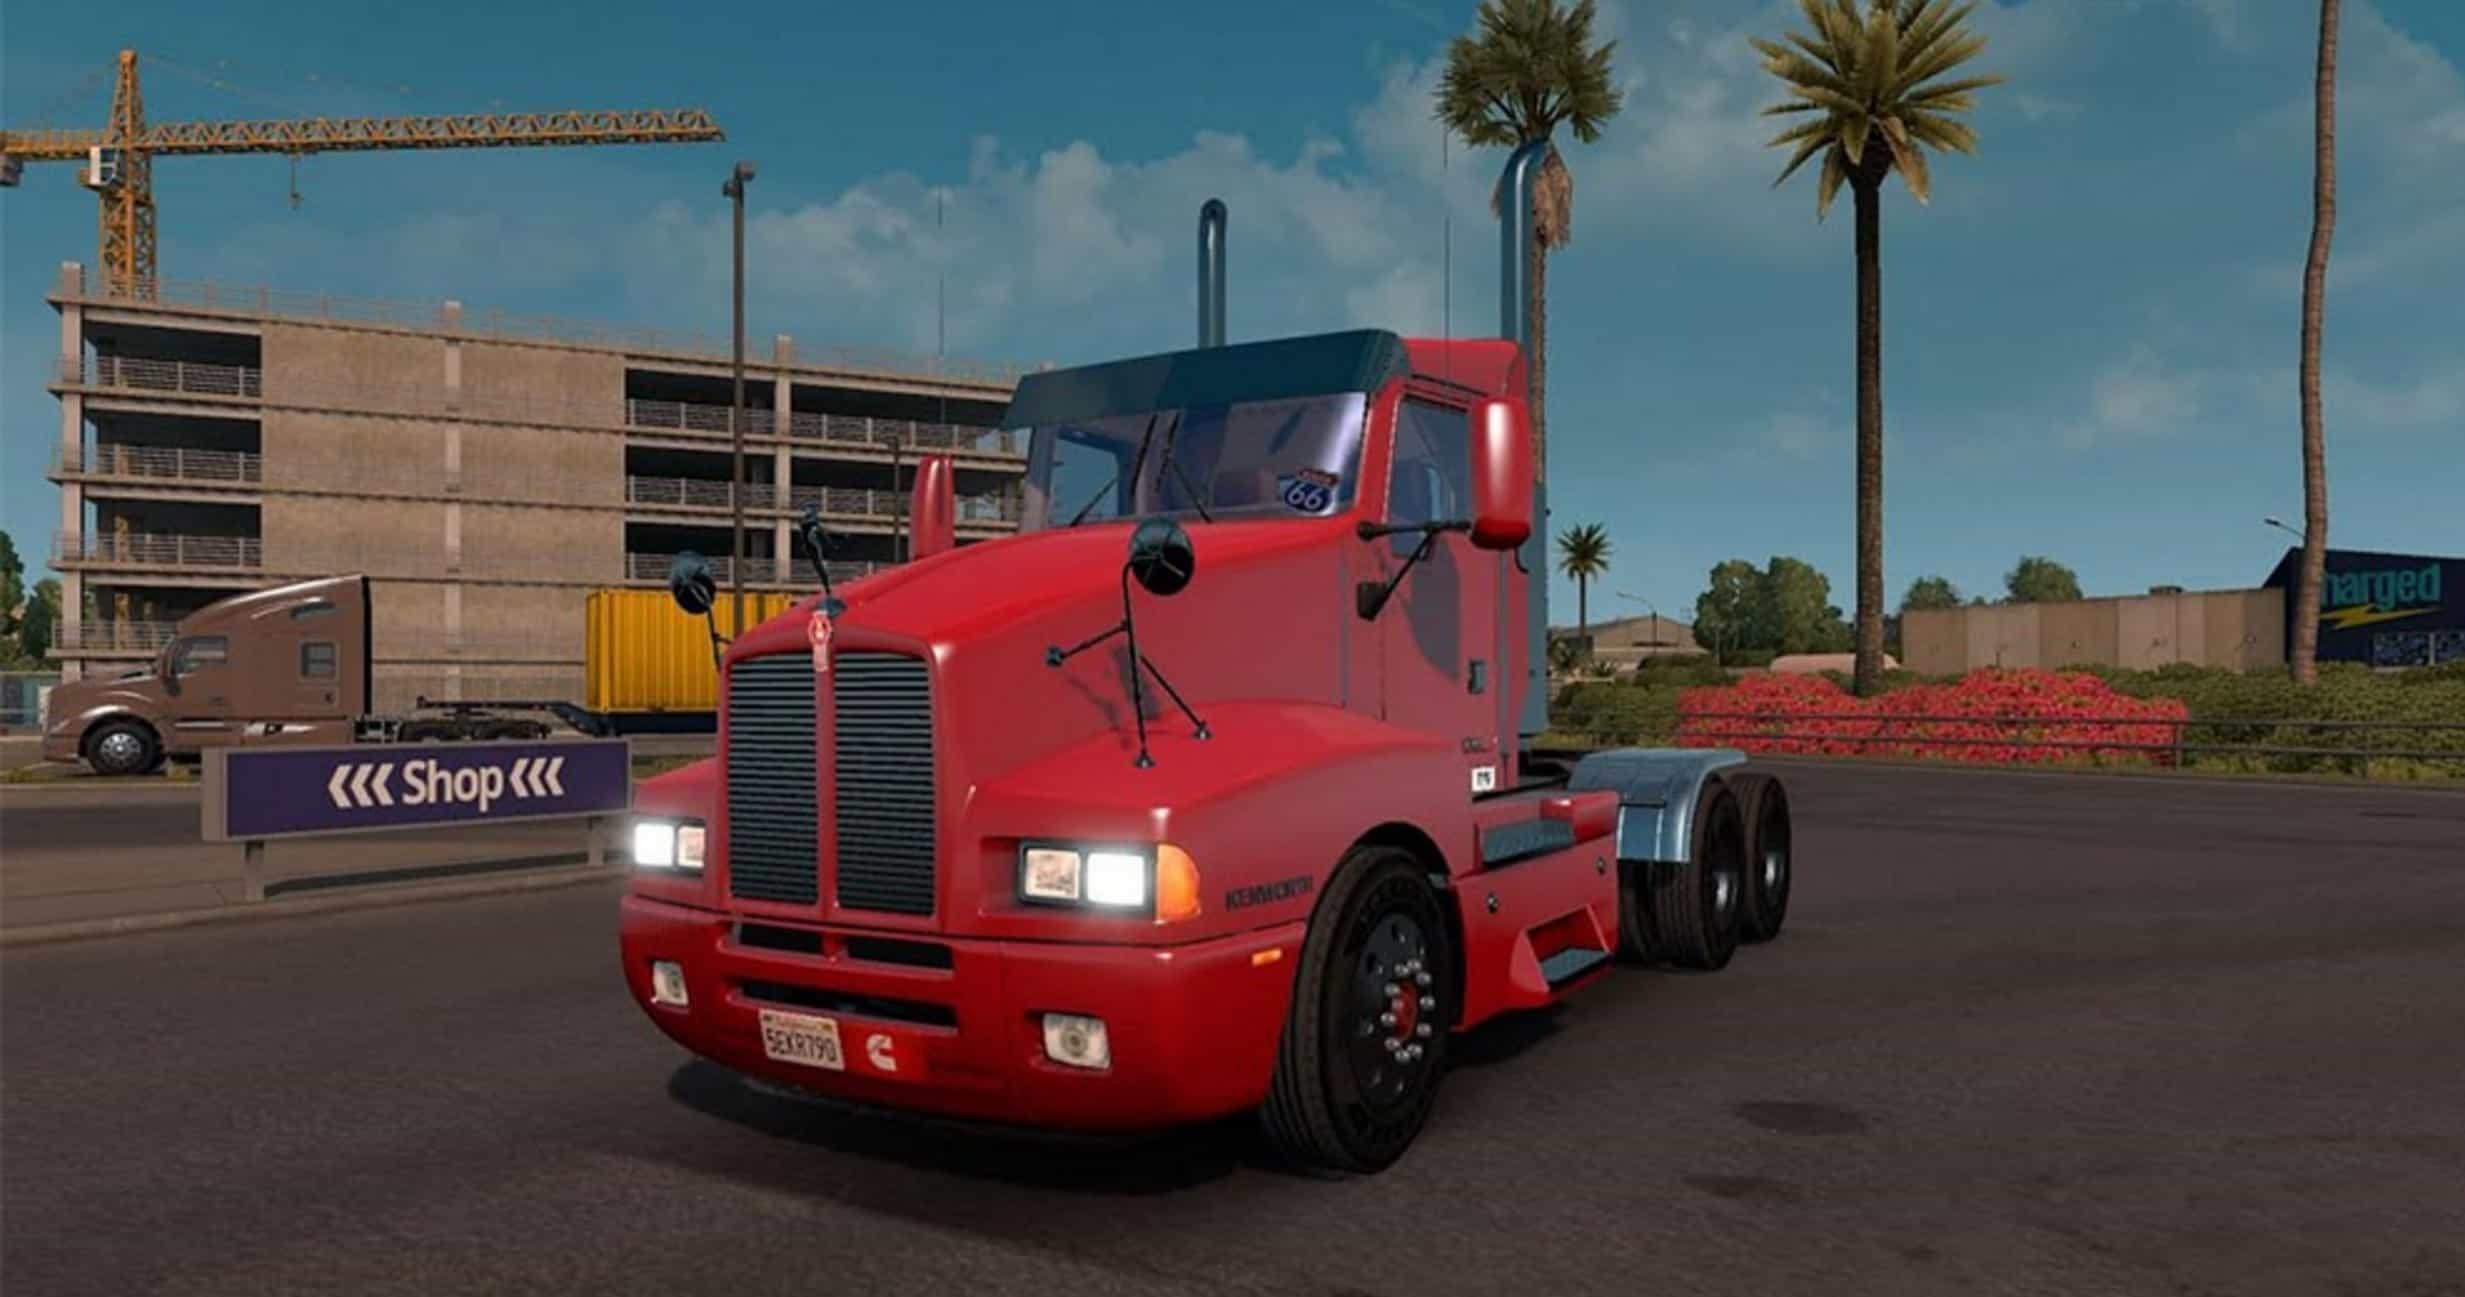 Kenworth T600 Day Cab Truck - American Truck Simulator mod | ATS mod